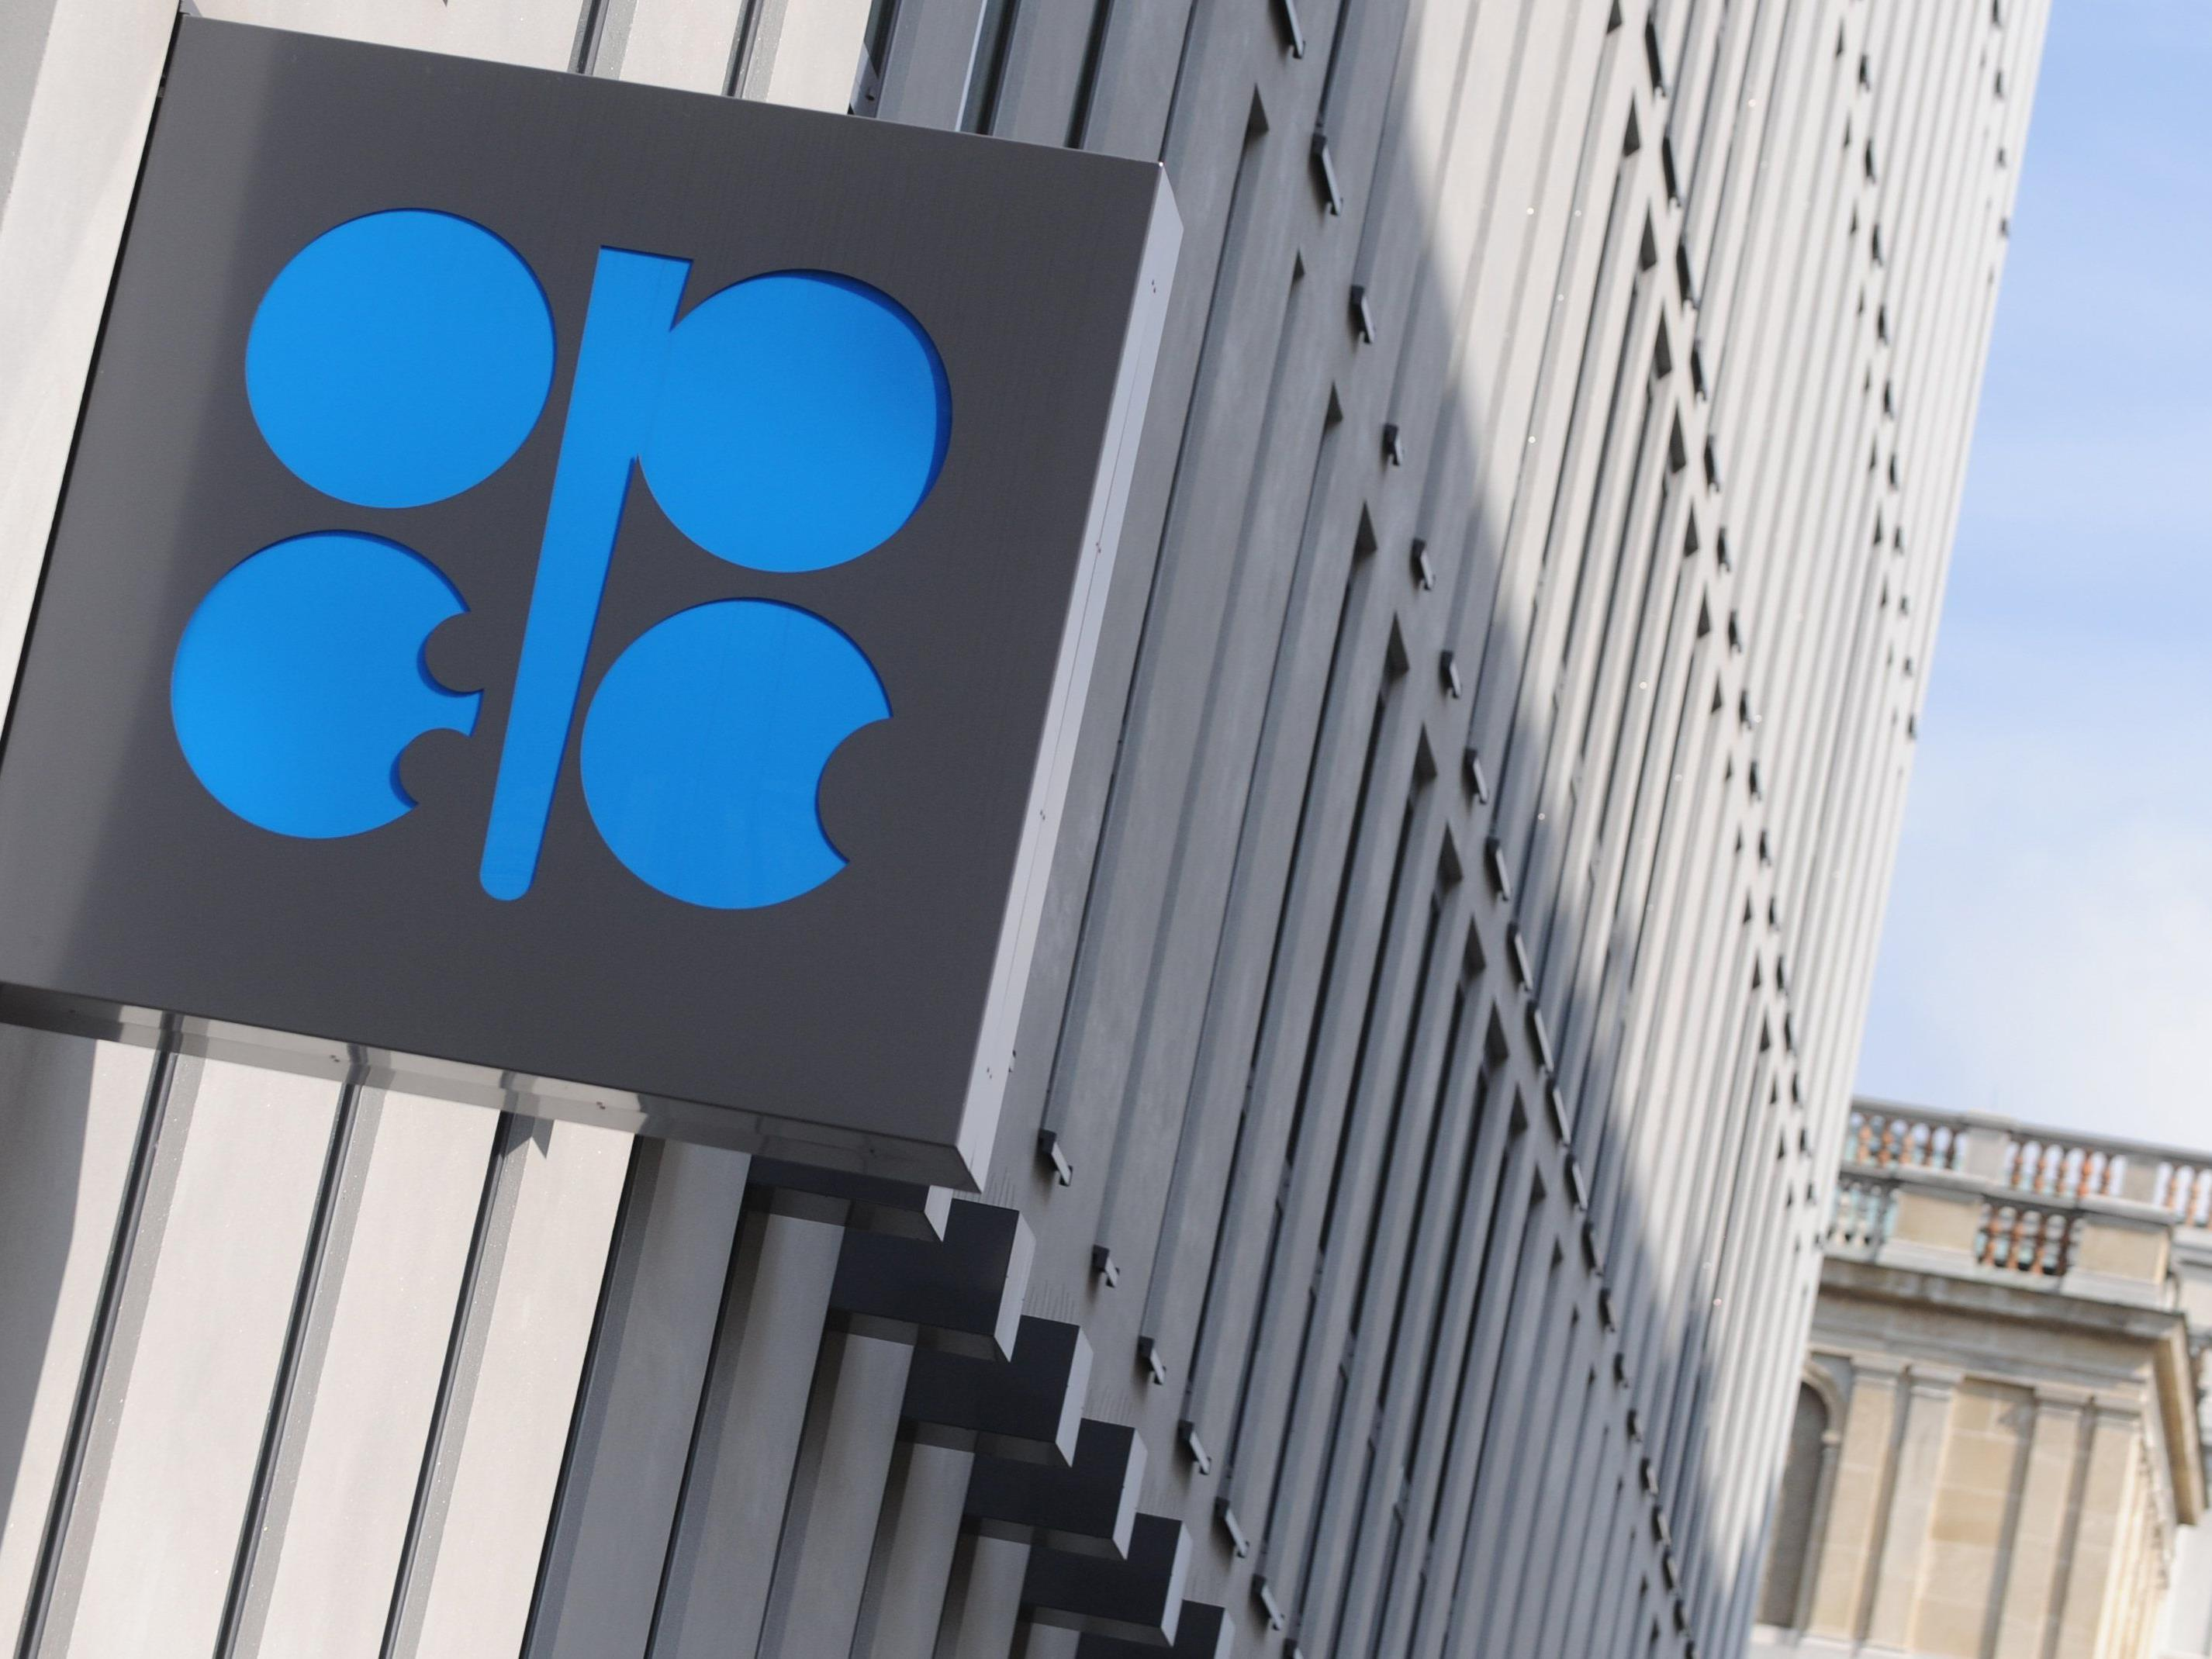 Das OPEC-Gebäude in Wien.